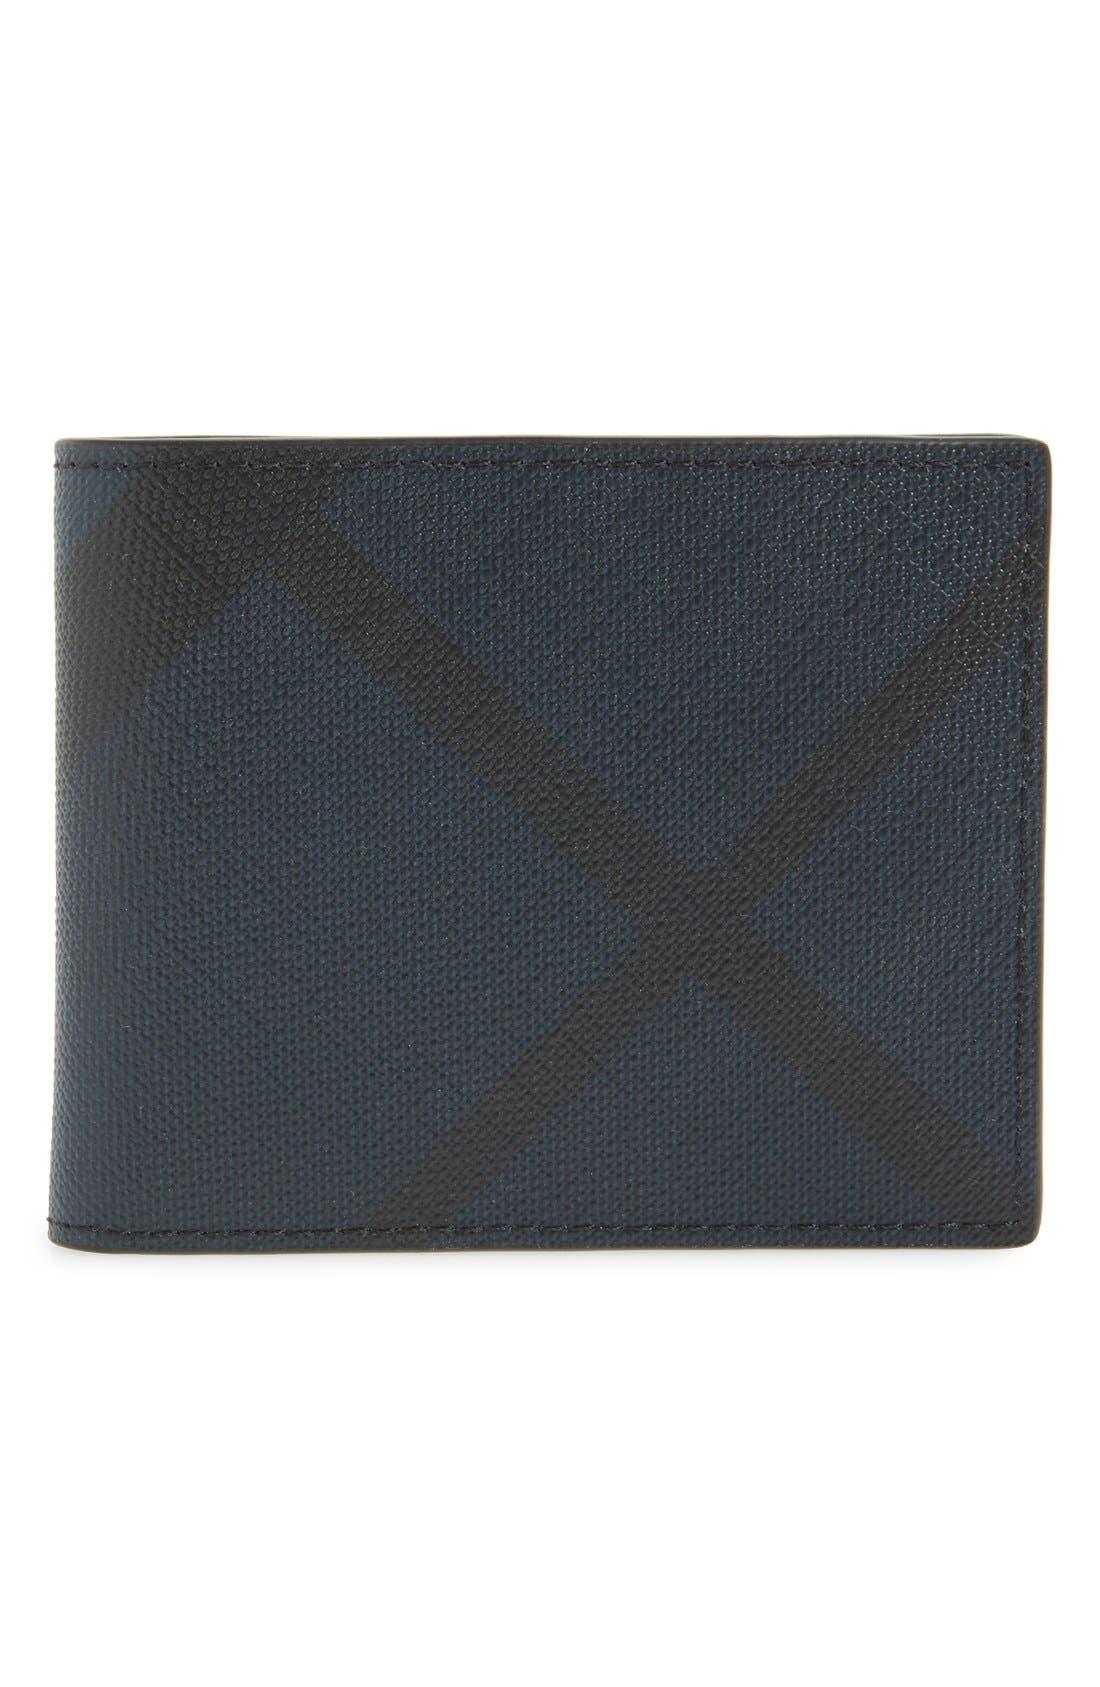 Check Wallet,                         Main,                         color, NAVY/ BLACK